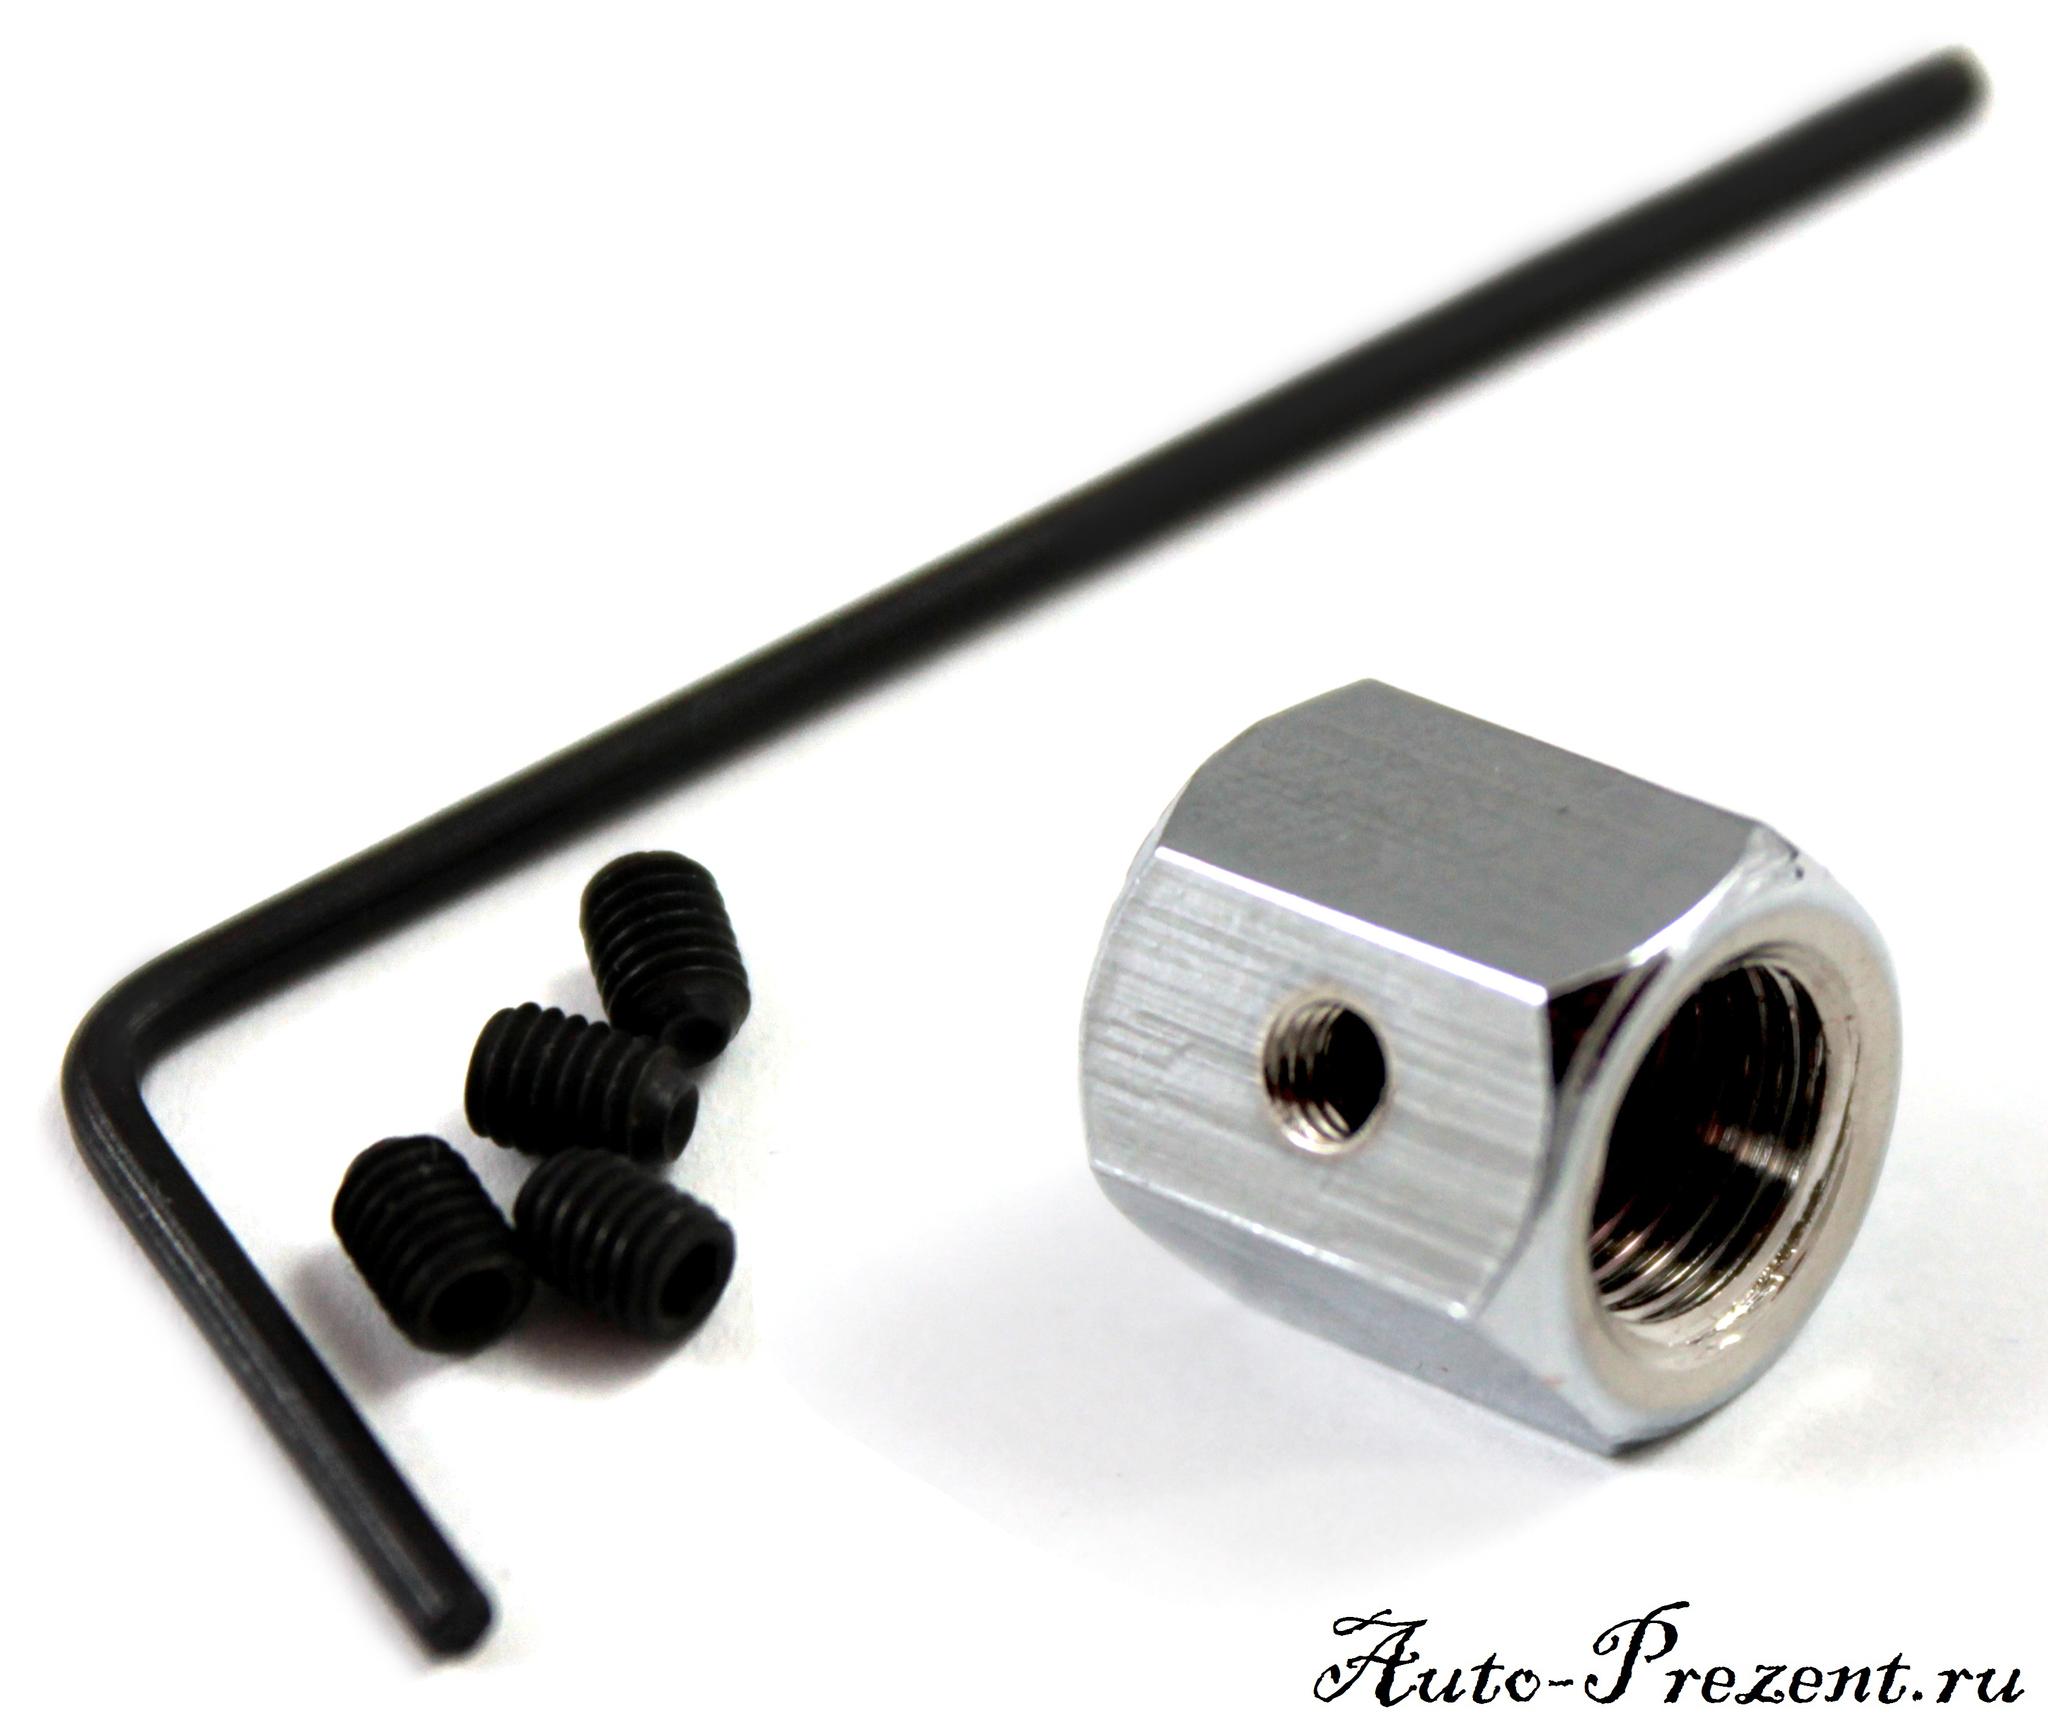 Колпачки на ниппель KIA с защитой от кражи